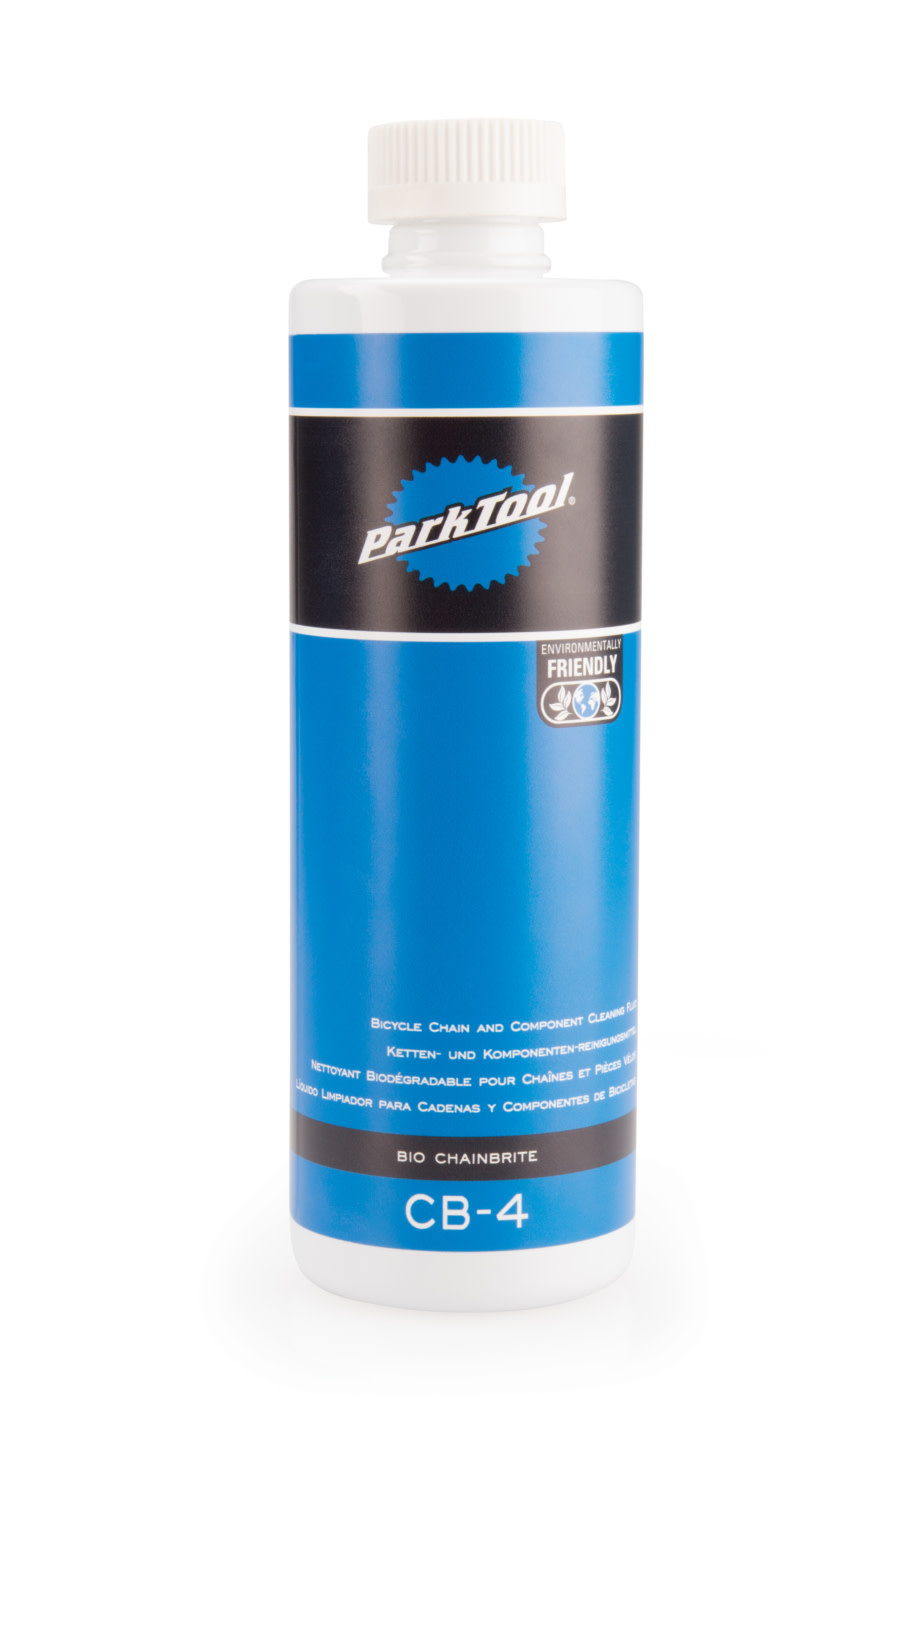 Park Tool CB-4 Bio ChainBrite Degreaser